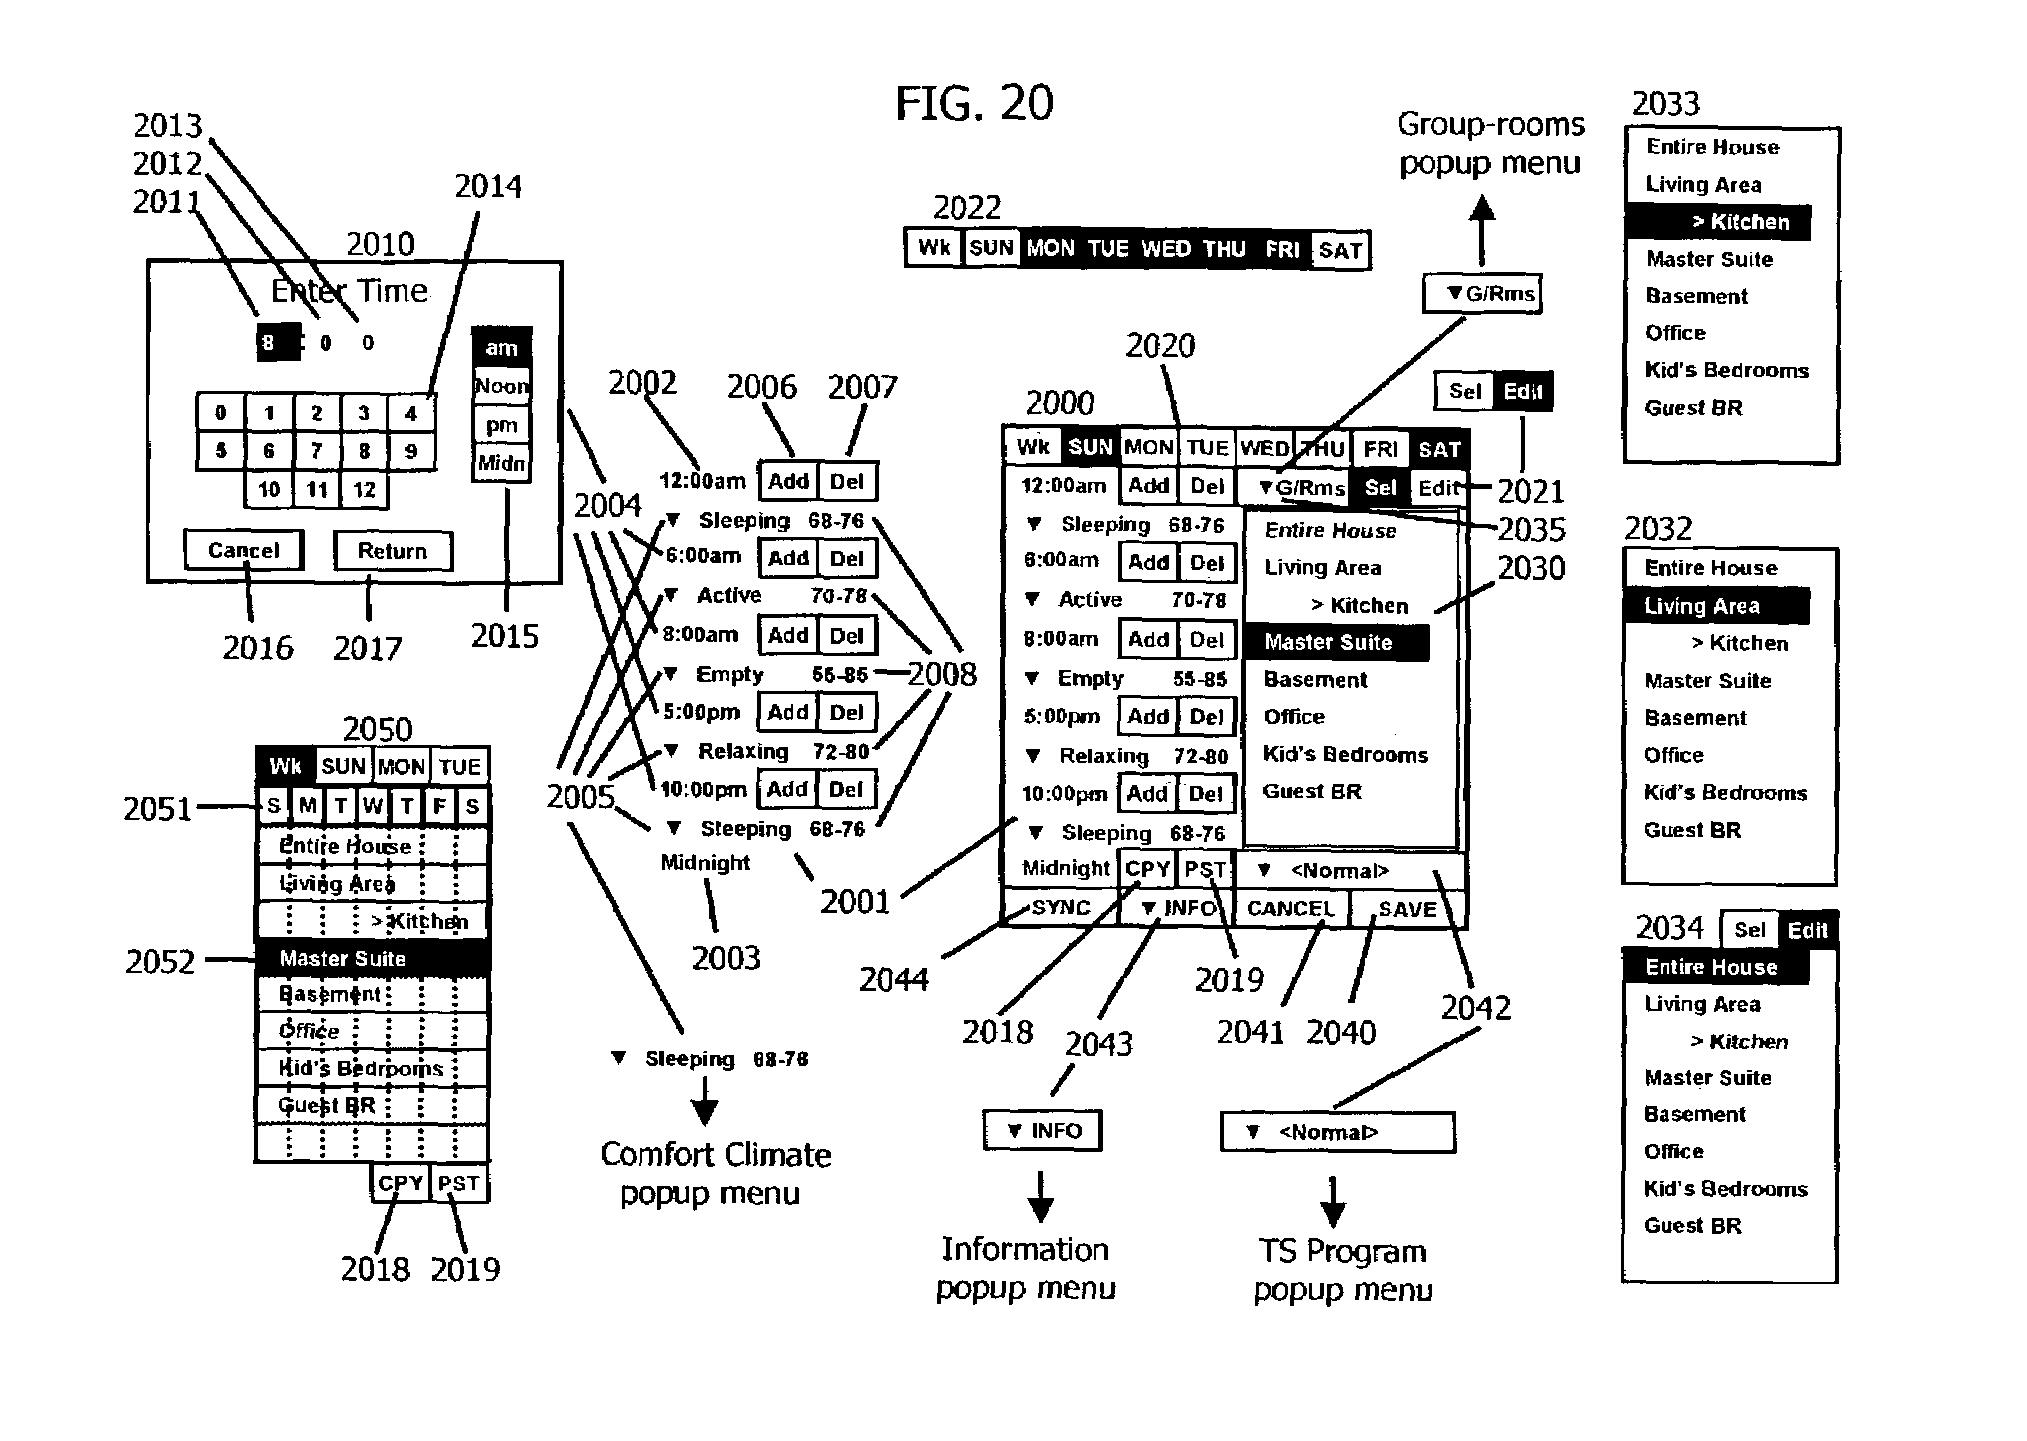 Hvac System: April 2015